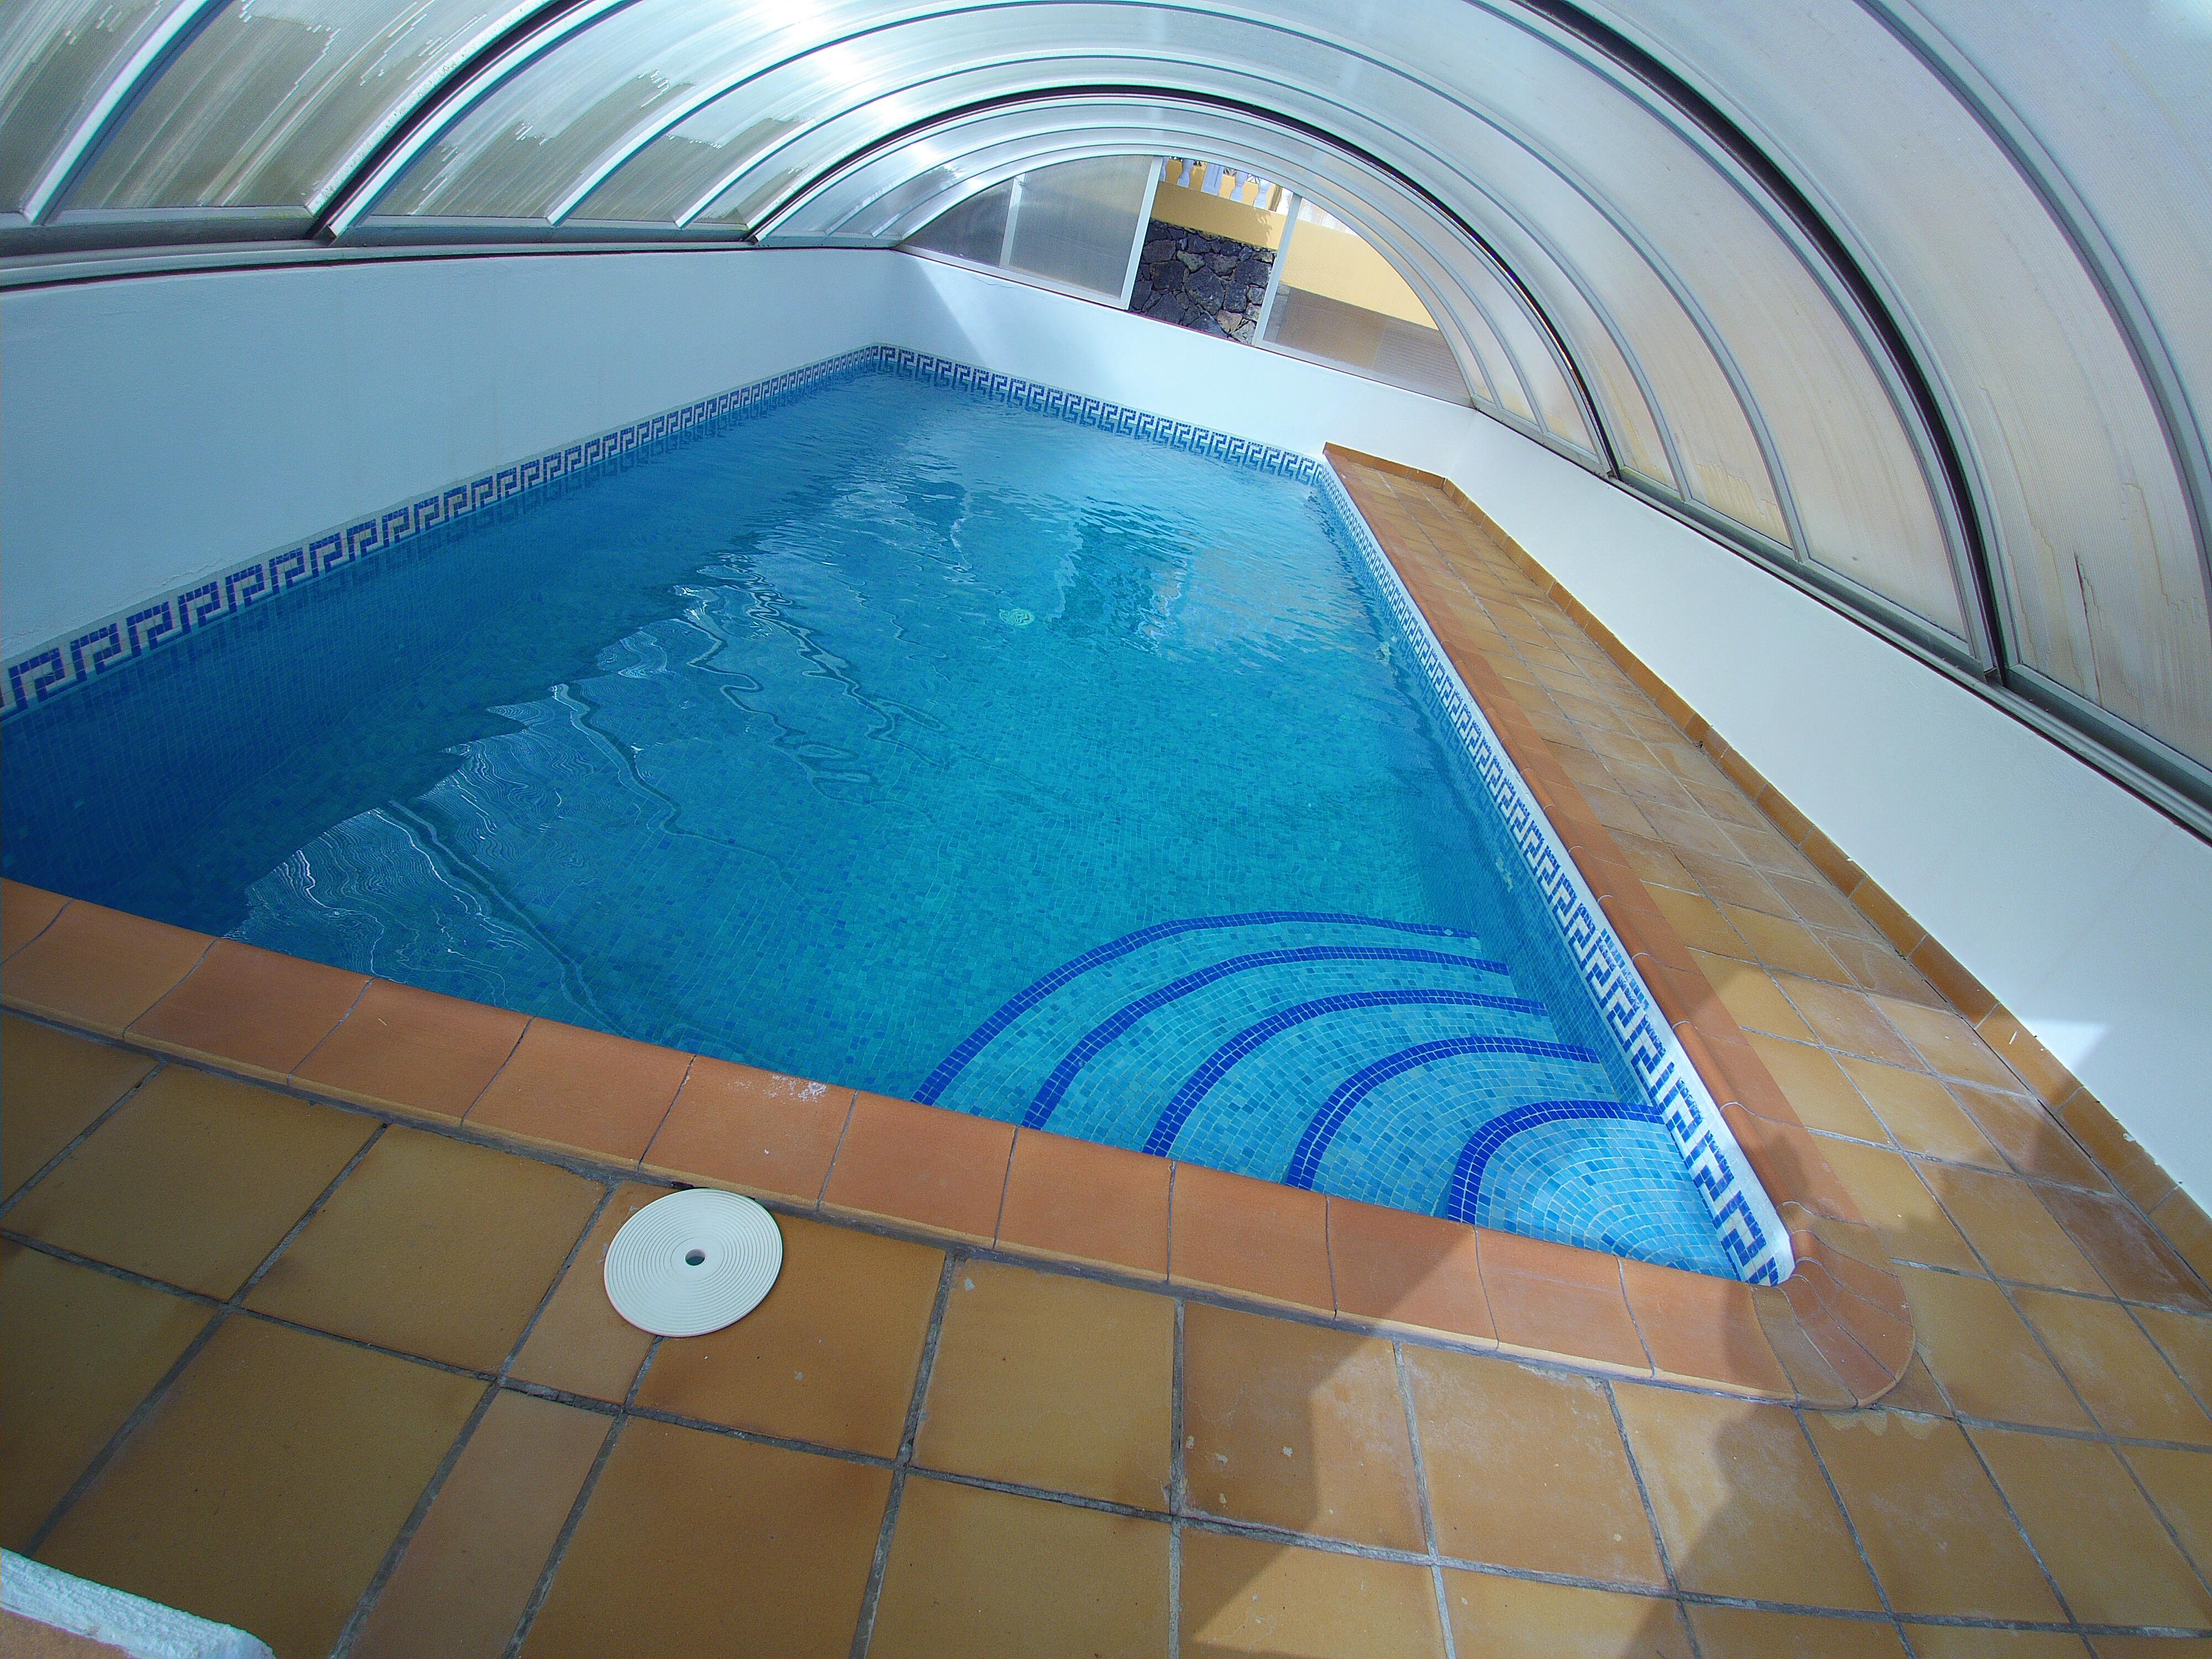 Maison de vacances Villa Primavera beheizbarer Pool kostenloses Wifi Grill (2125225), El Sauzal, Ténérife, Iles Canaries, Espagne, image 4